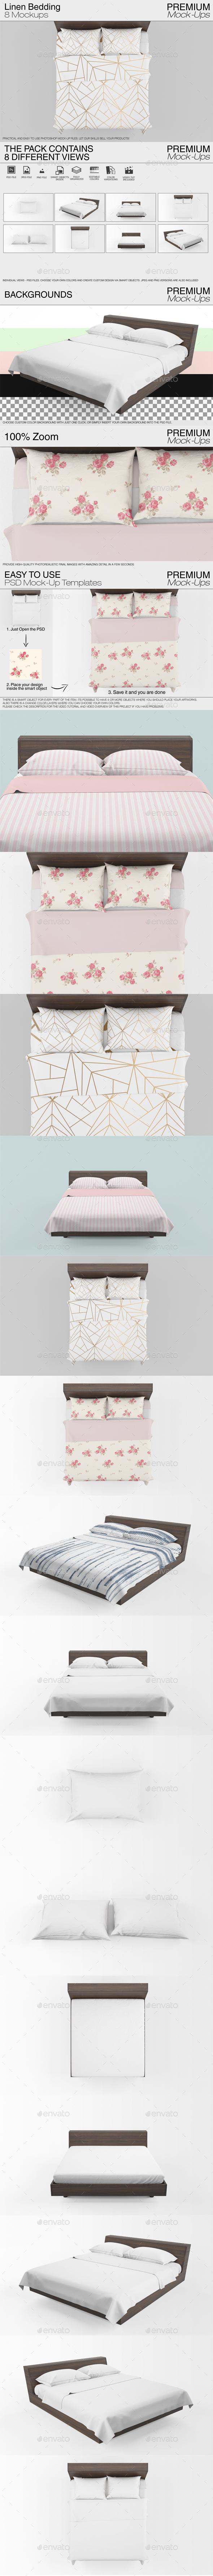 GraphicRiver Linen Bedding Mockup 20238603